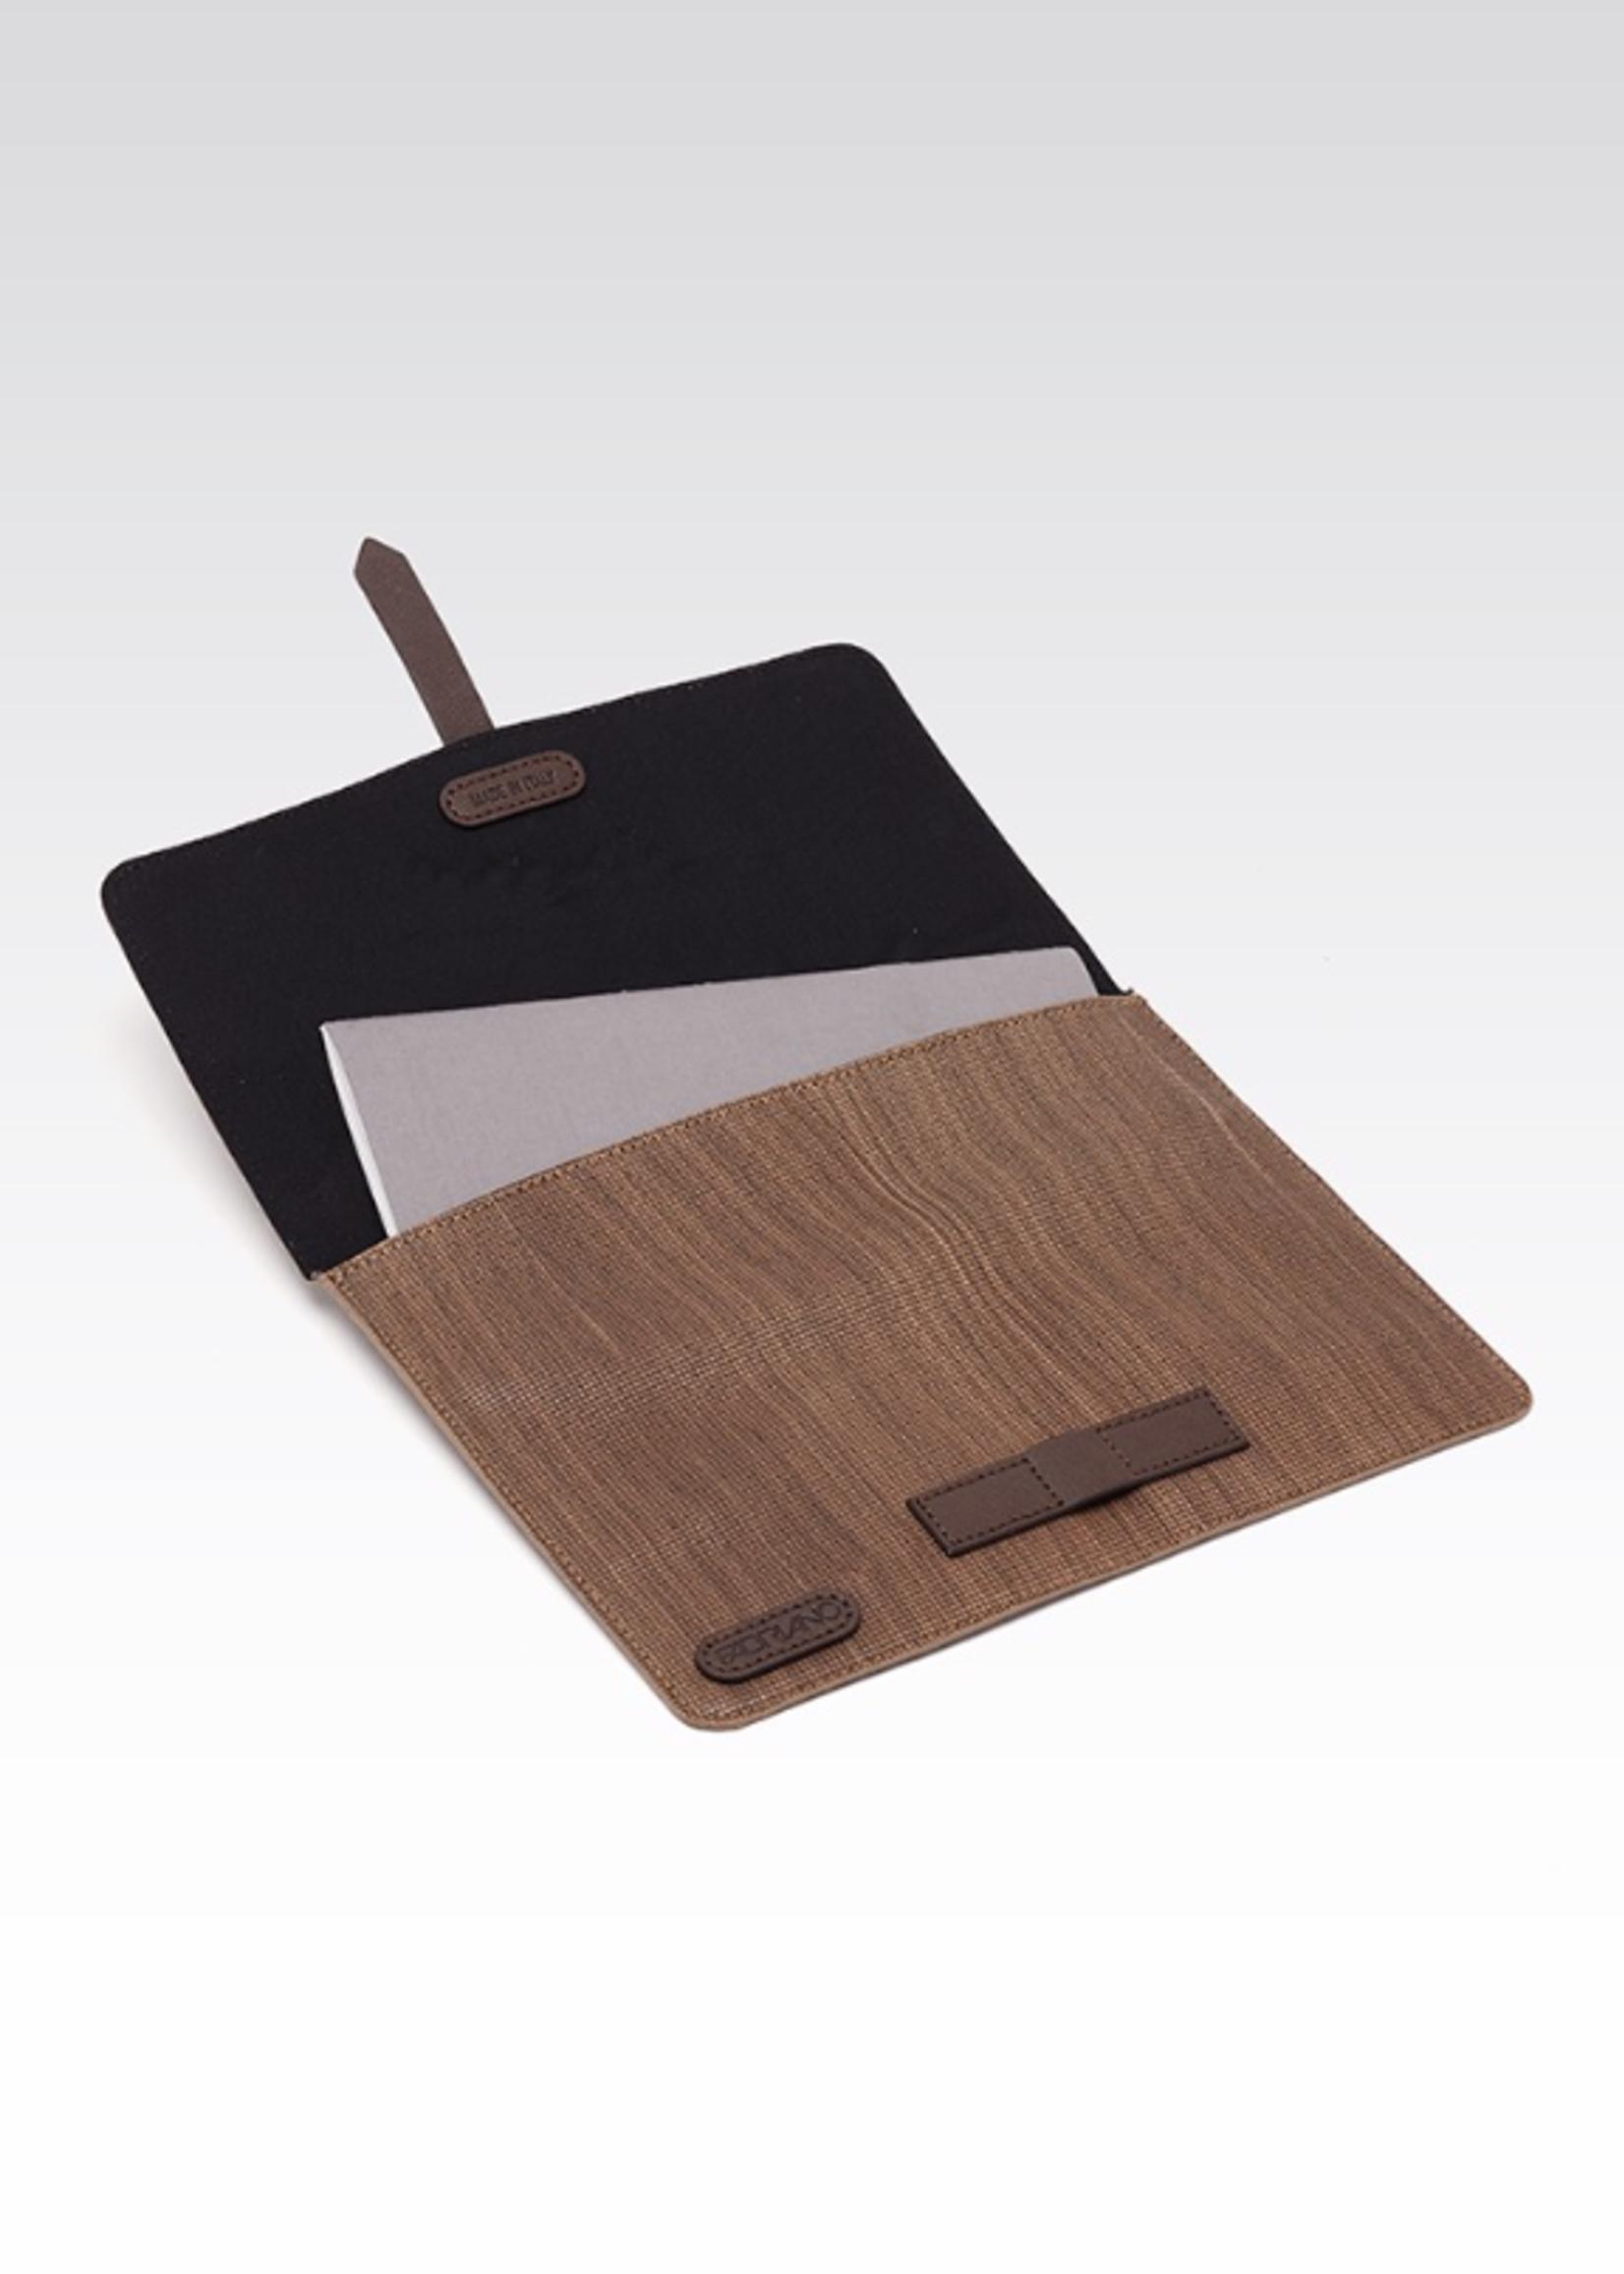 Fabriano Fabriano Portadocumenti Folder Walnut